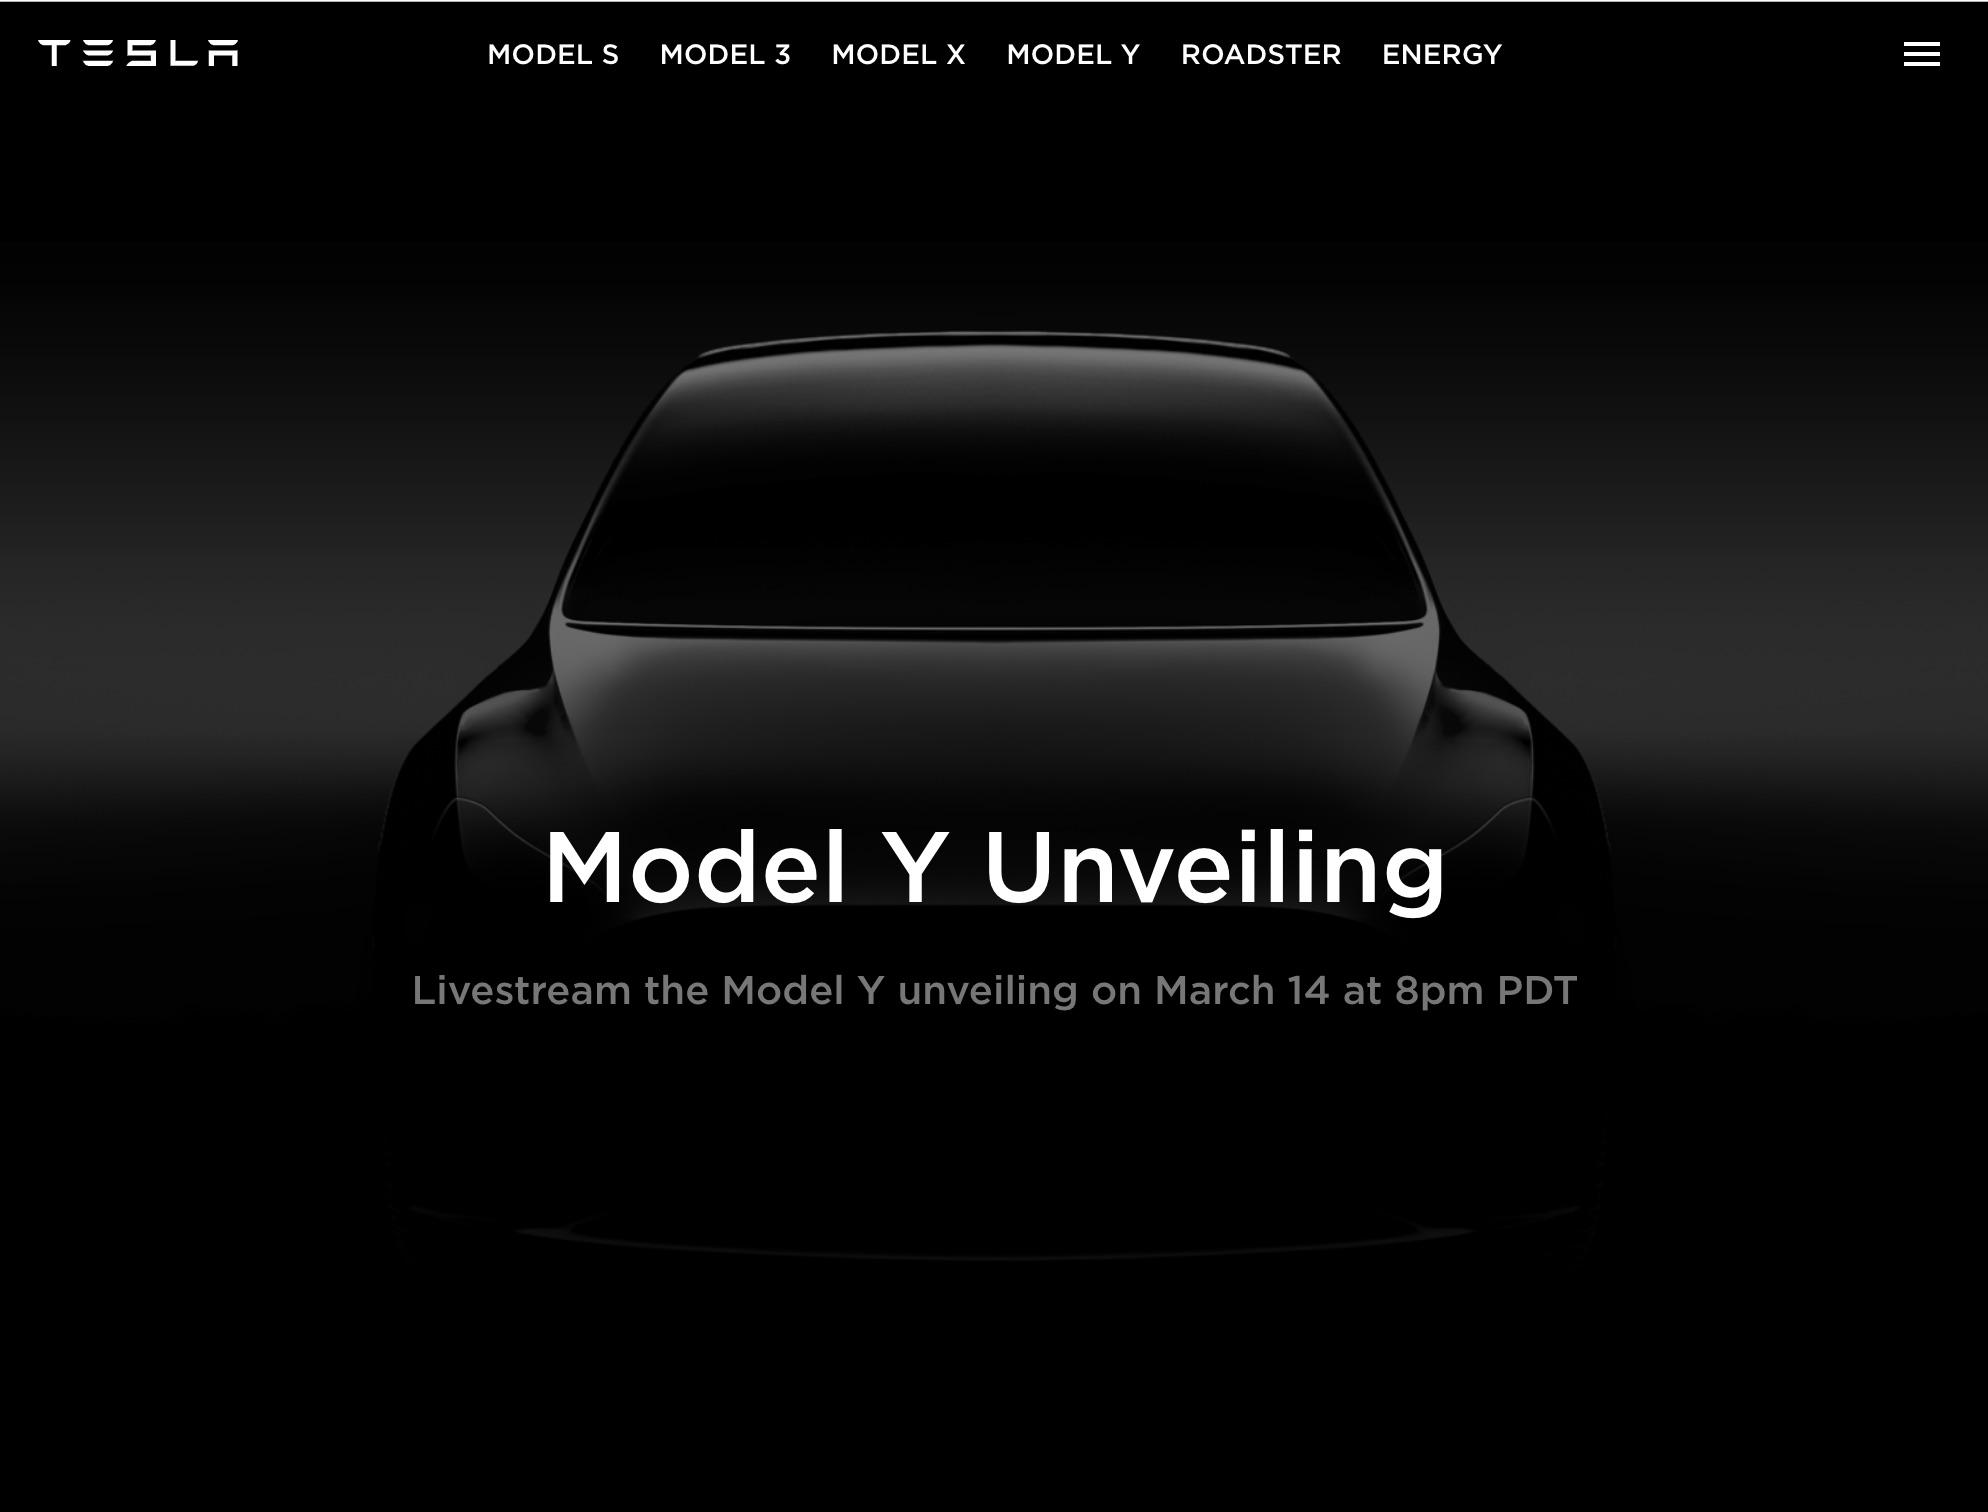 tesla-model-y-unveiling-livestream